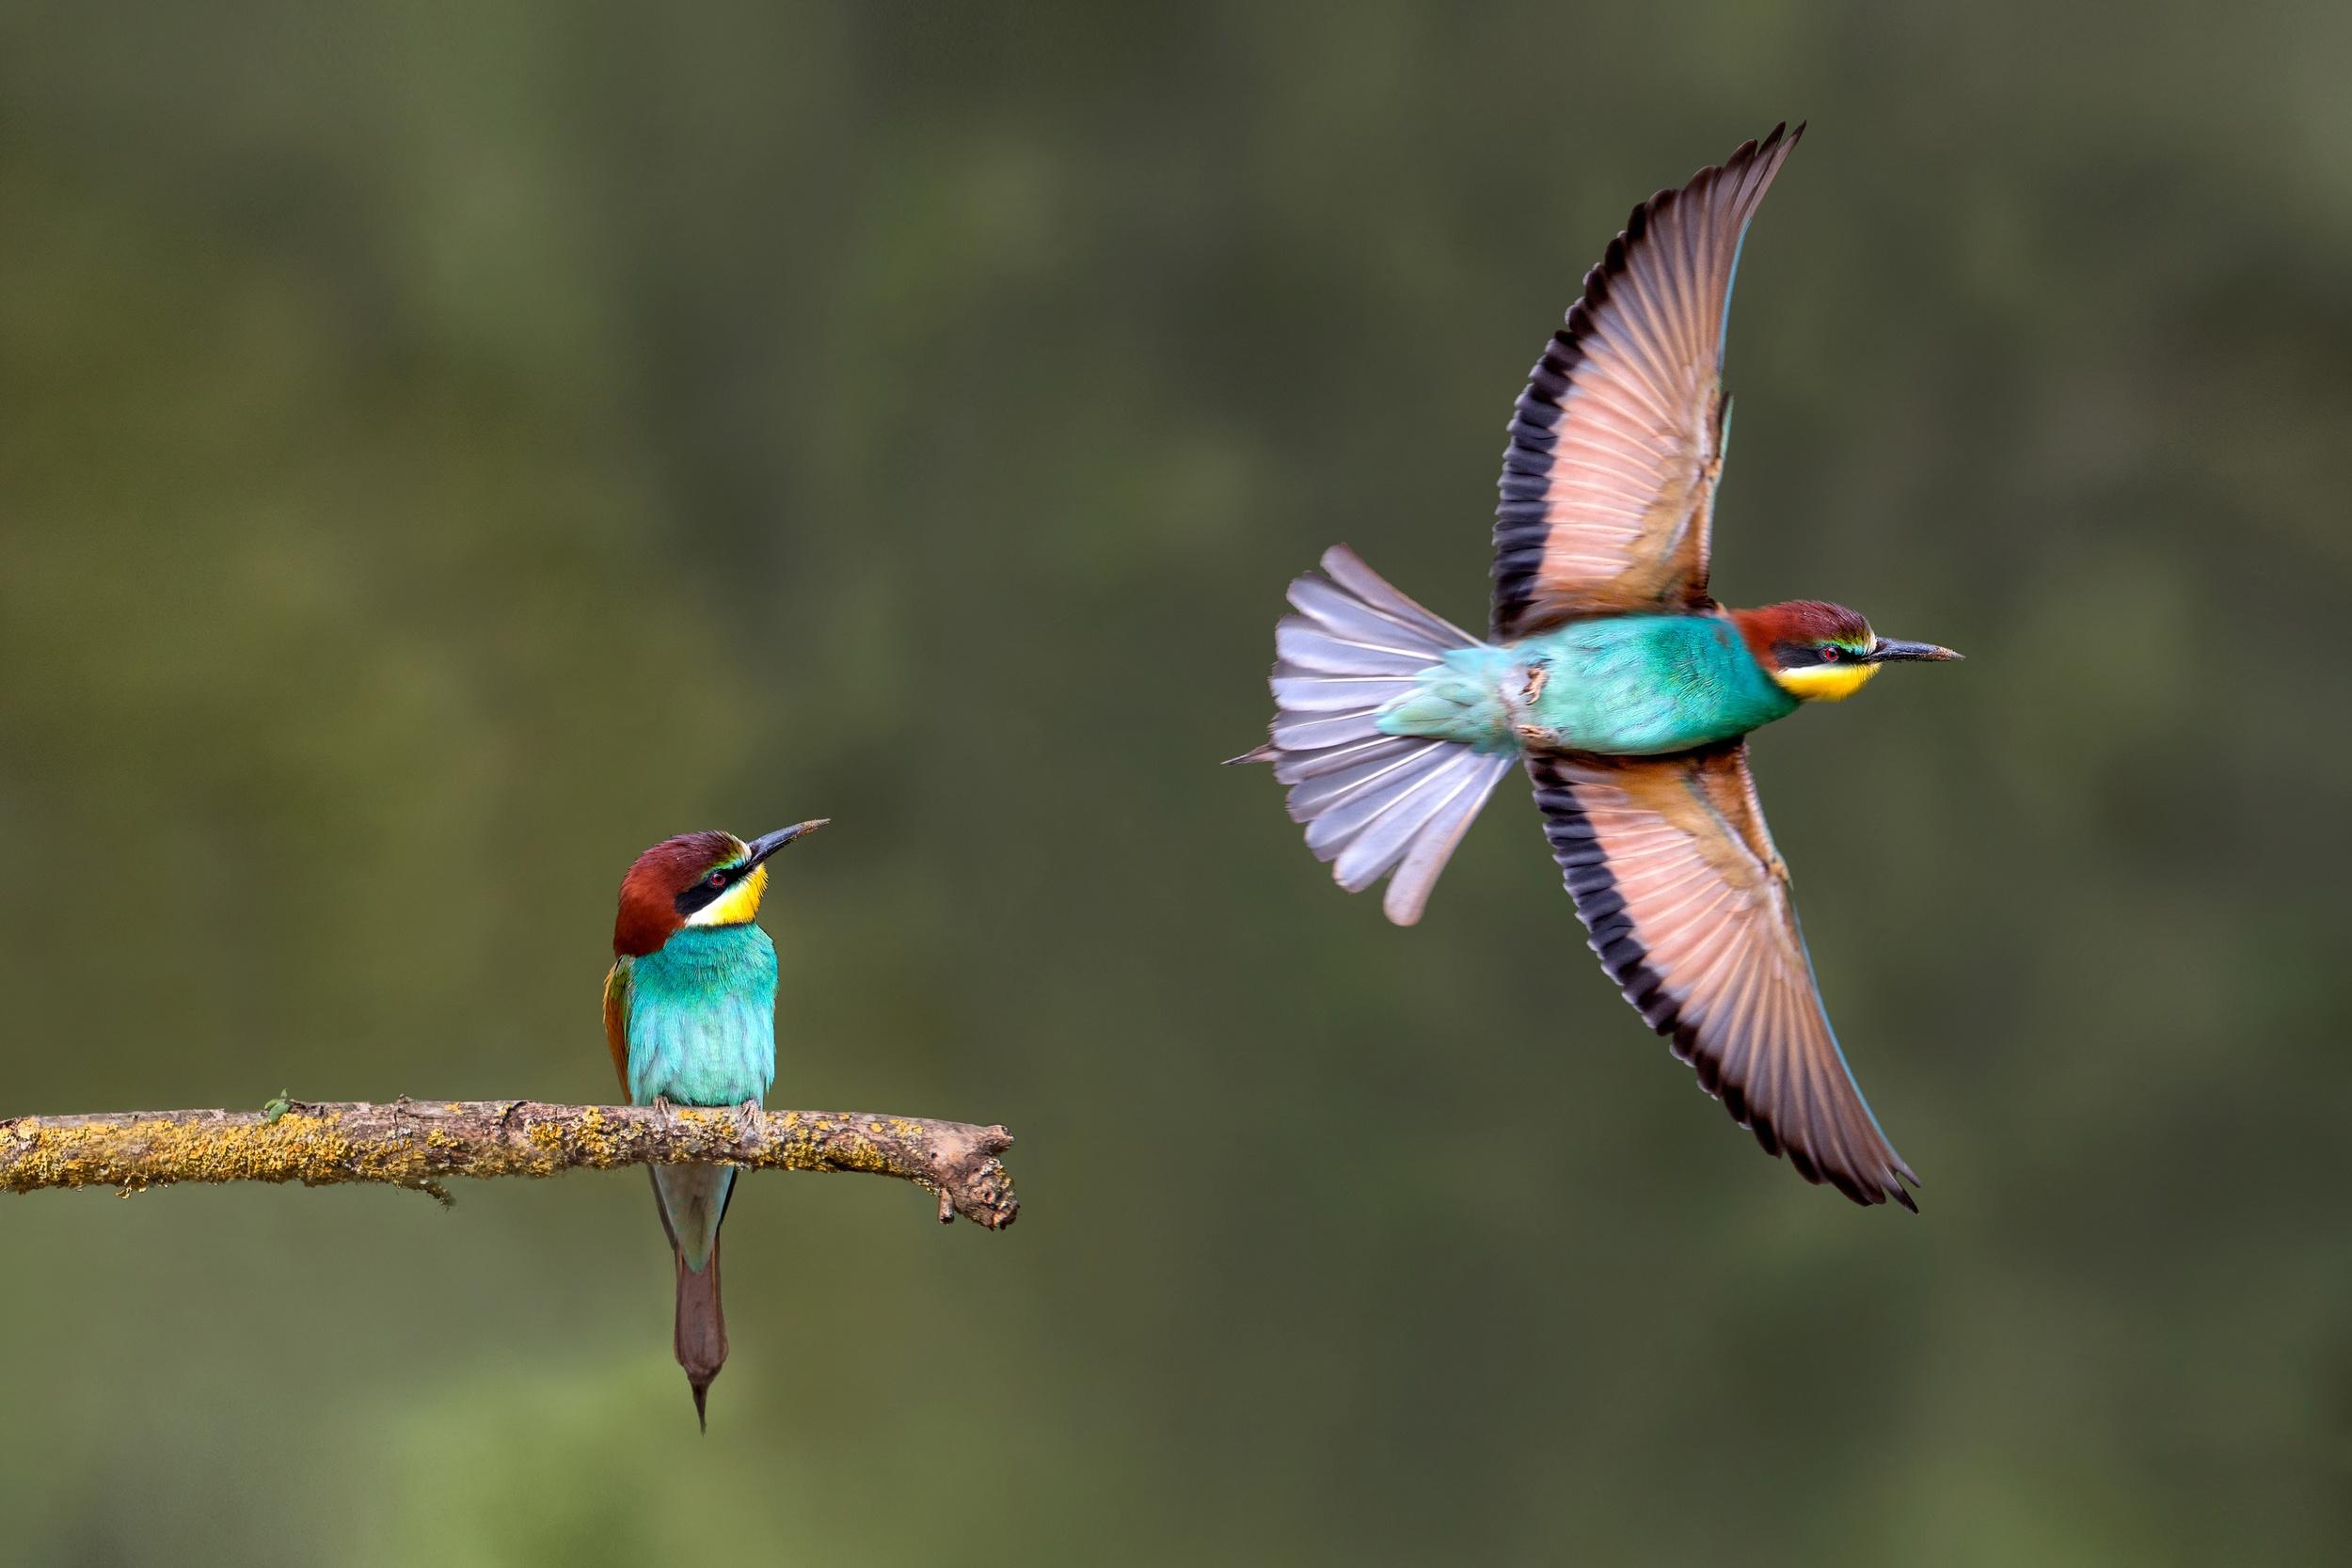 Images Birds Wings Merops 2 Flight Animals 2500x1667 bird Two animal